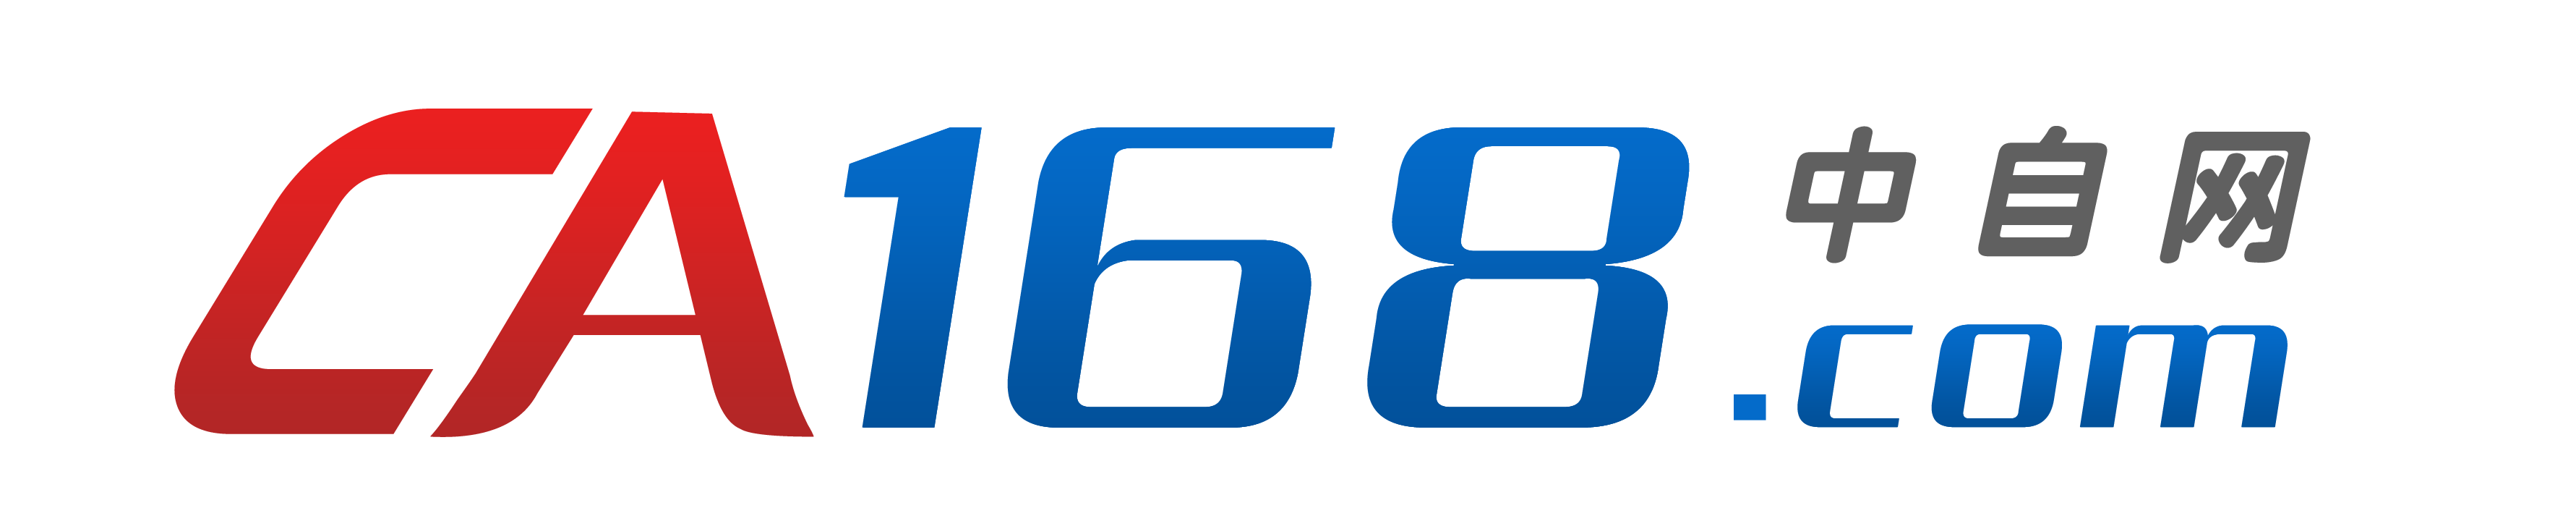 ca168